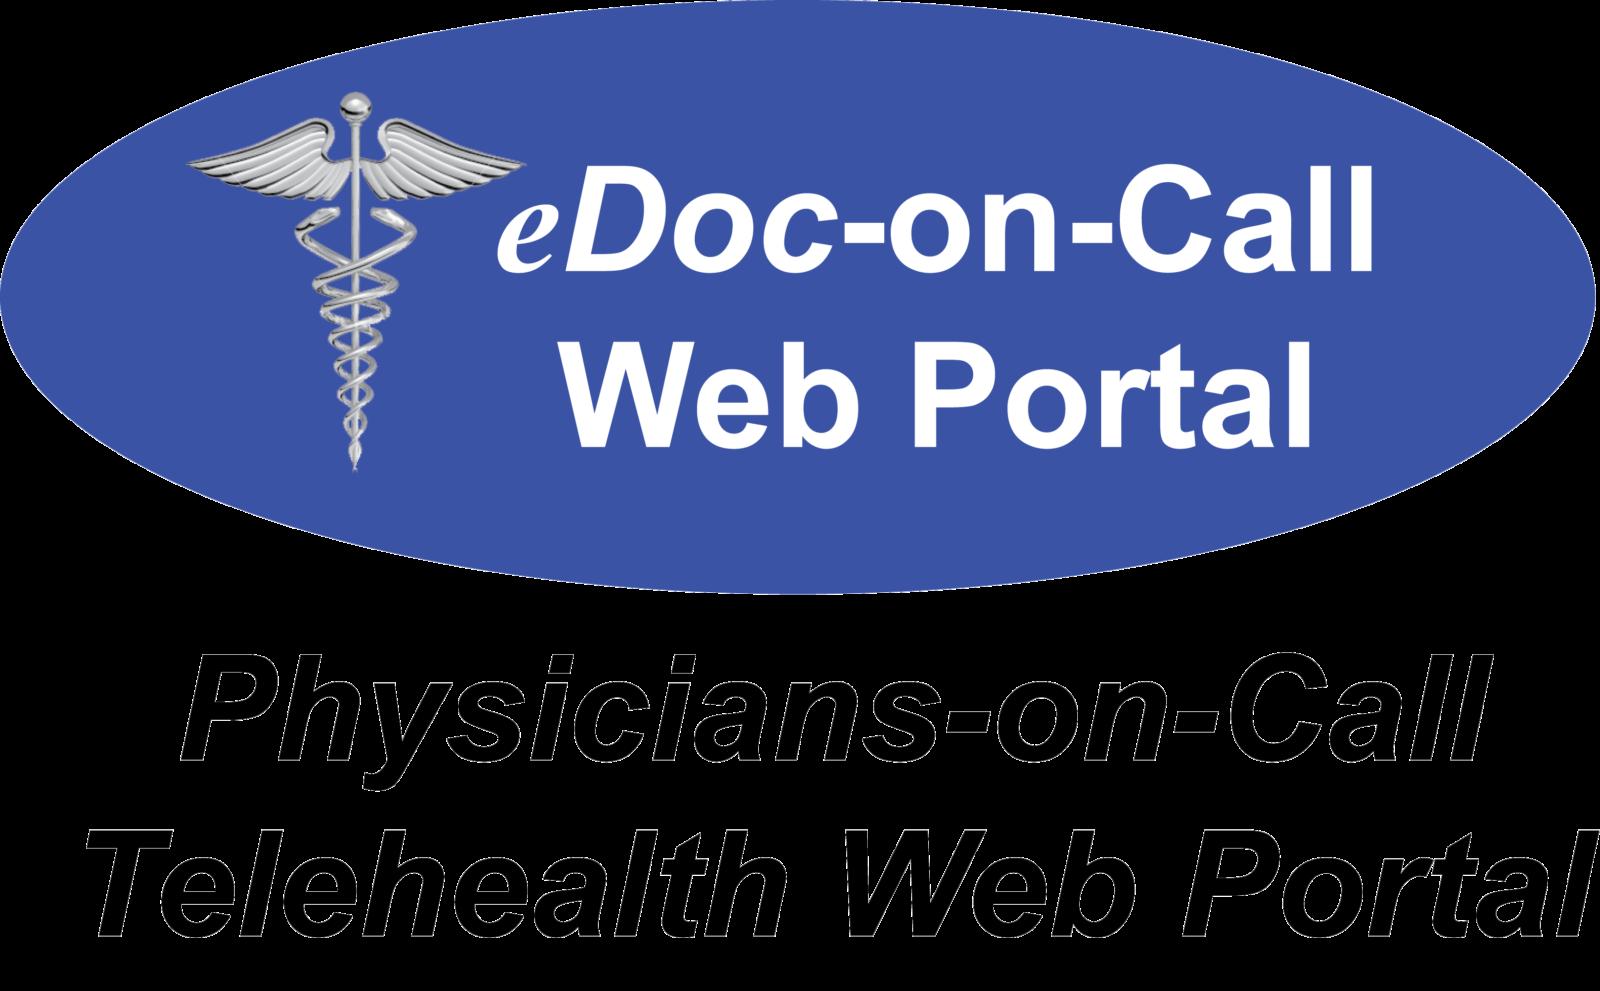 eDoc-on-Call web portal